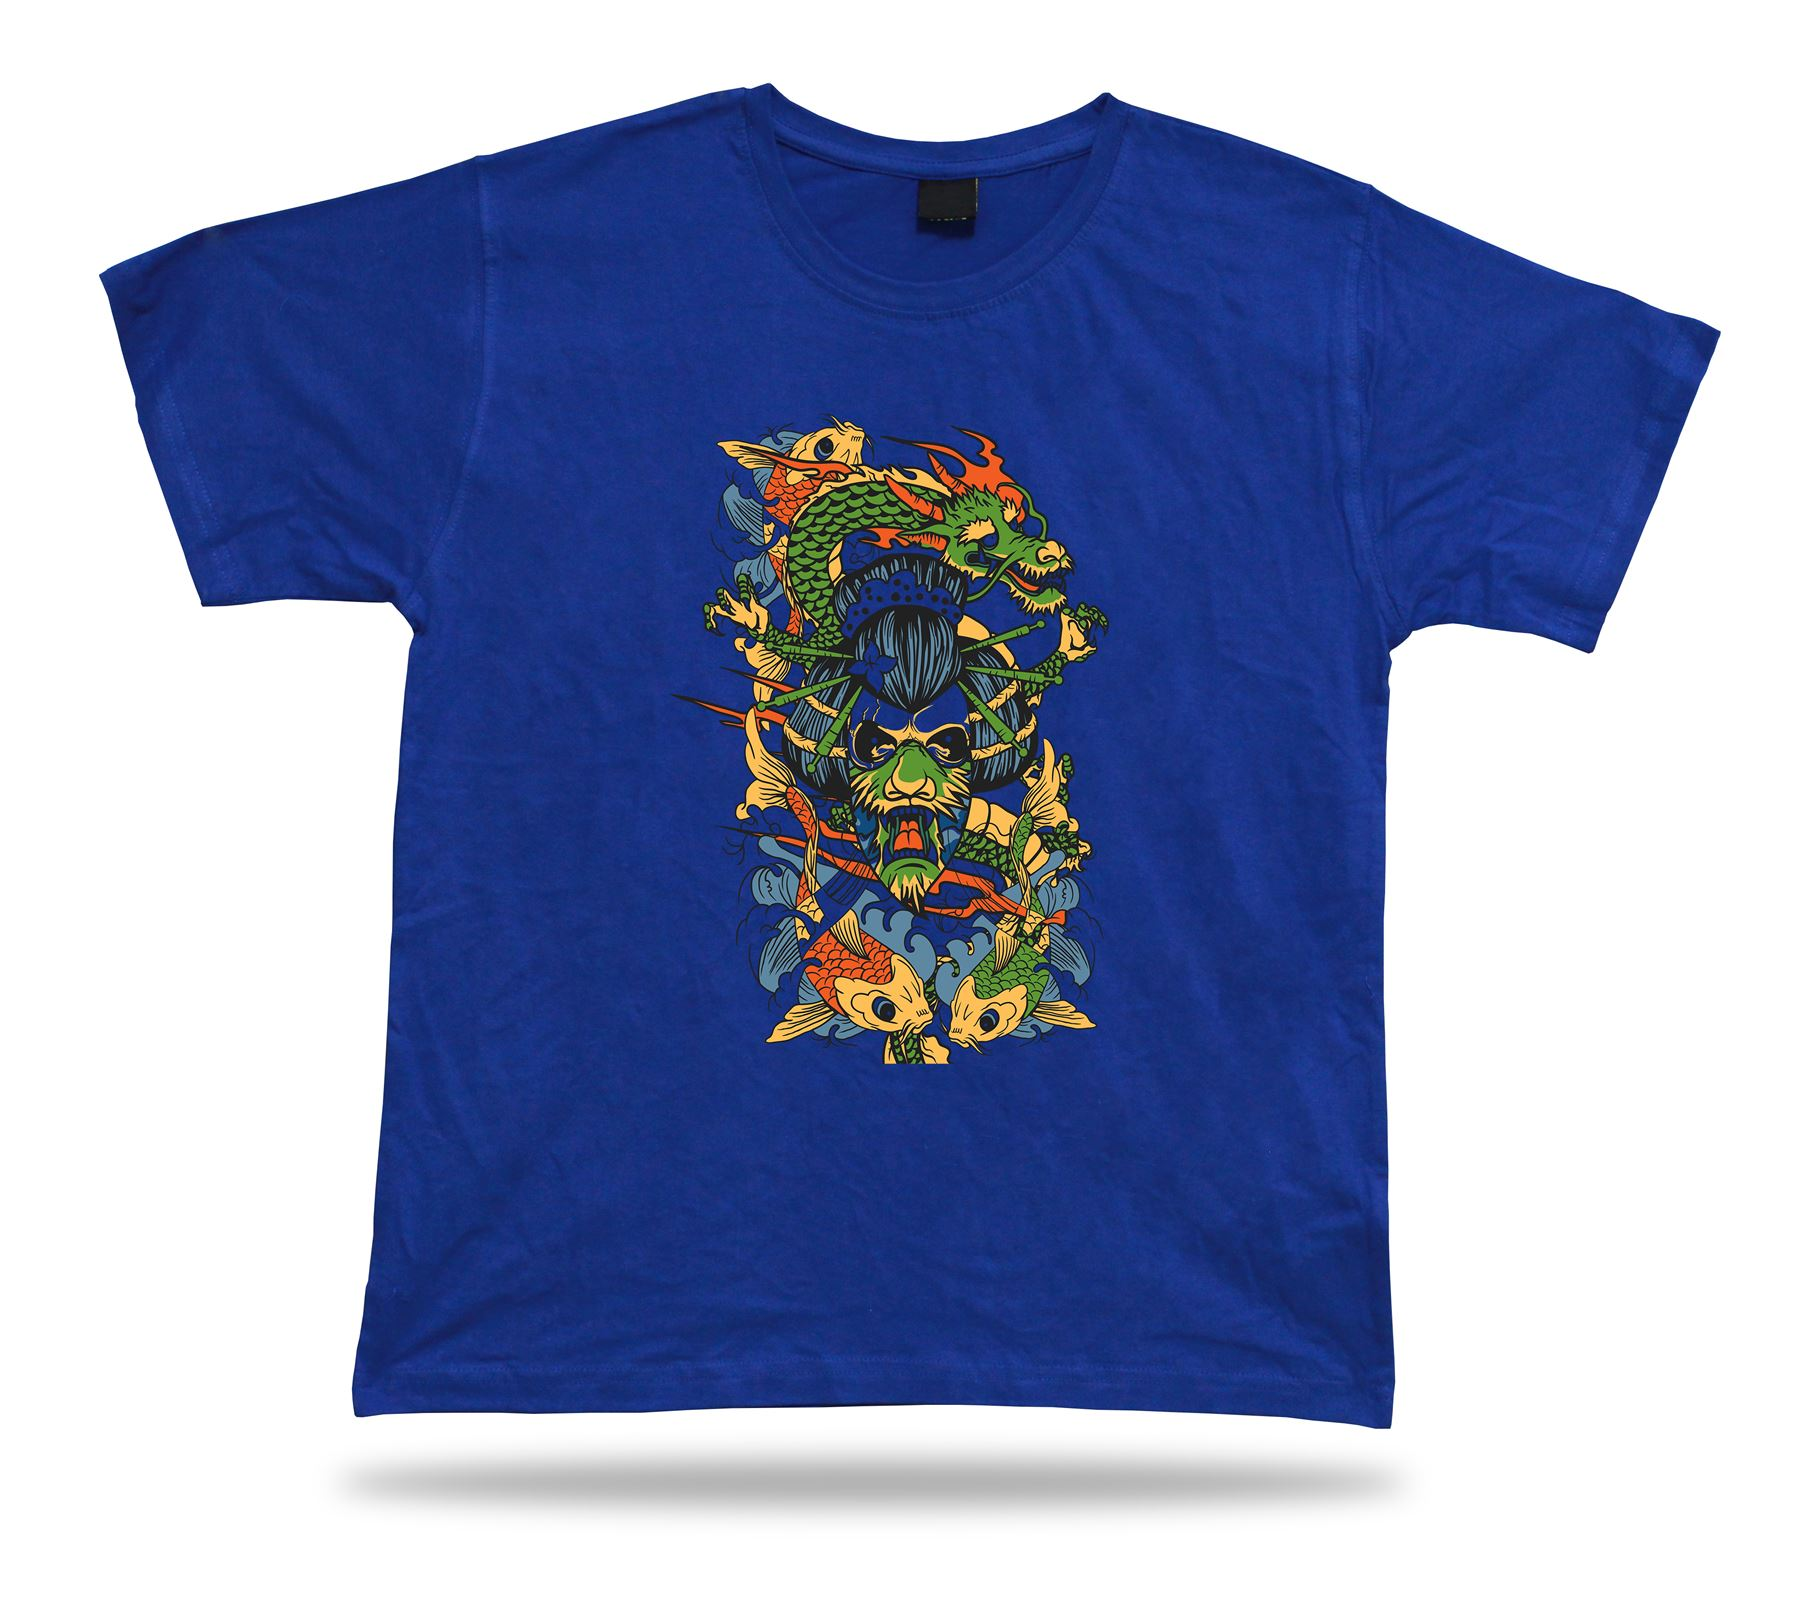 Japanese Dragon Kabuki Mask Koi Fish tshirt design cartoon tee special gift